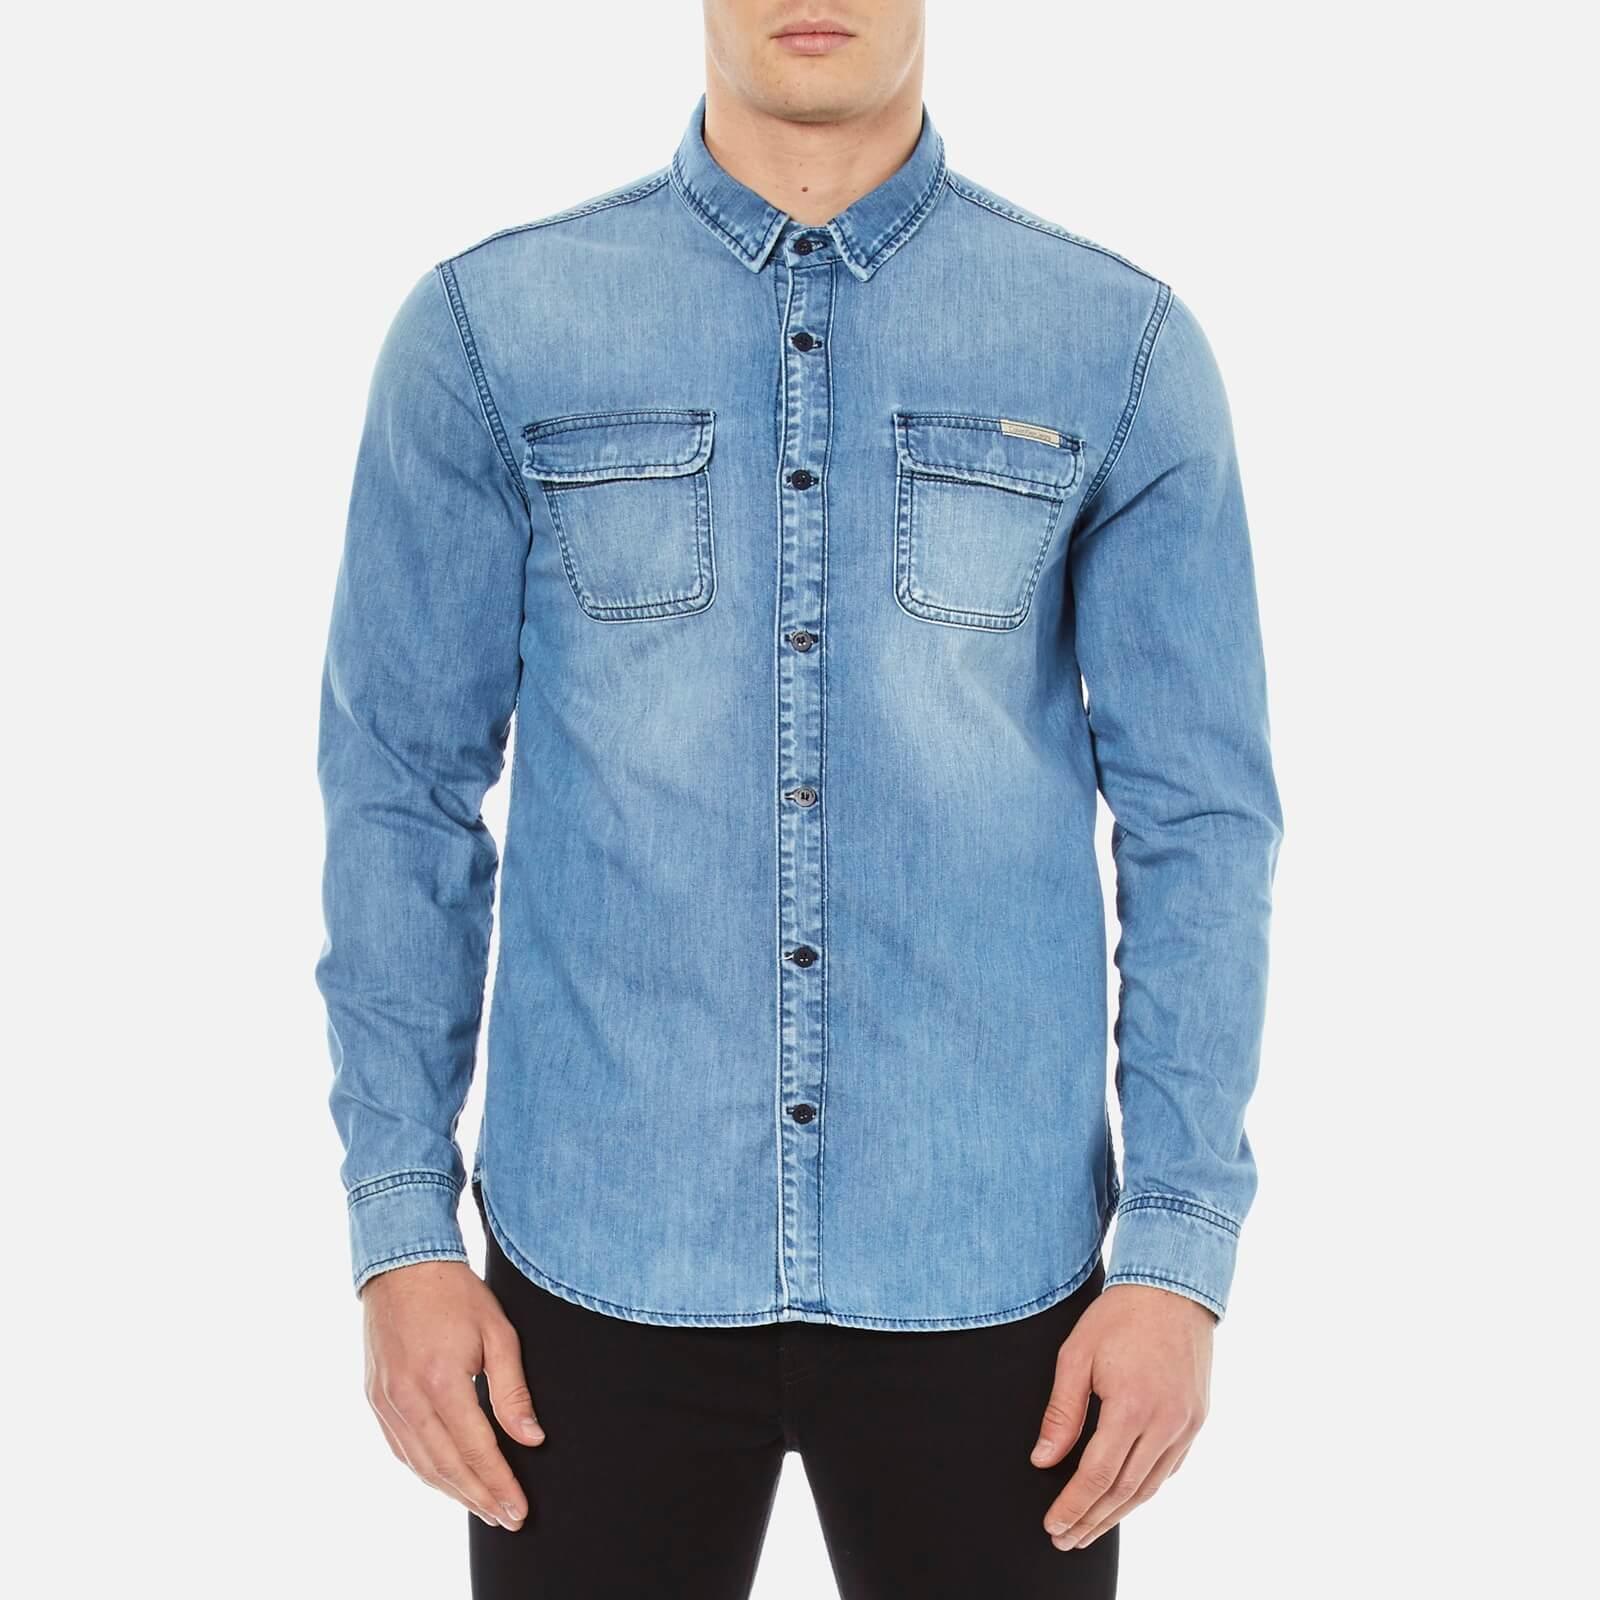 ea08817054 Calvin Klein Men s Classic Denim Shirt - Light Indigo Mens Clothing ...